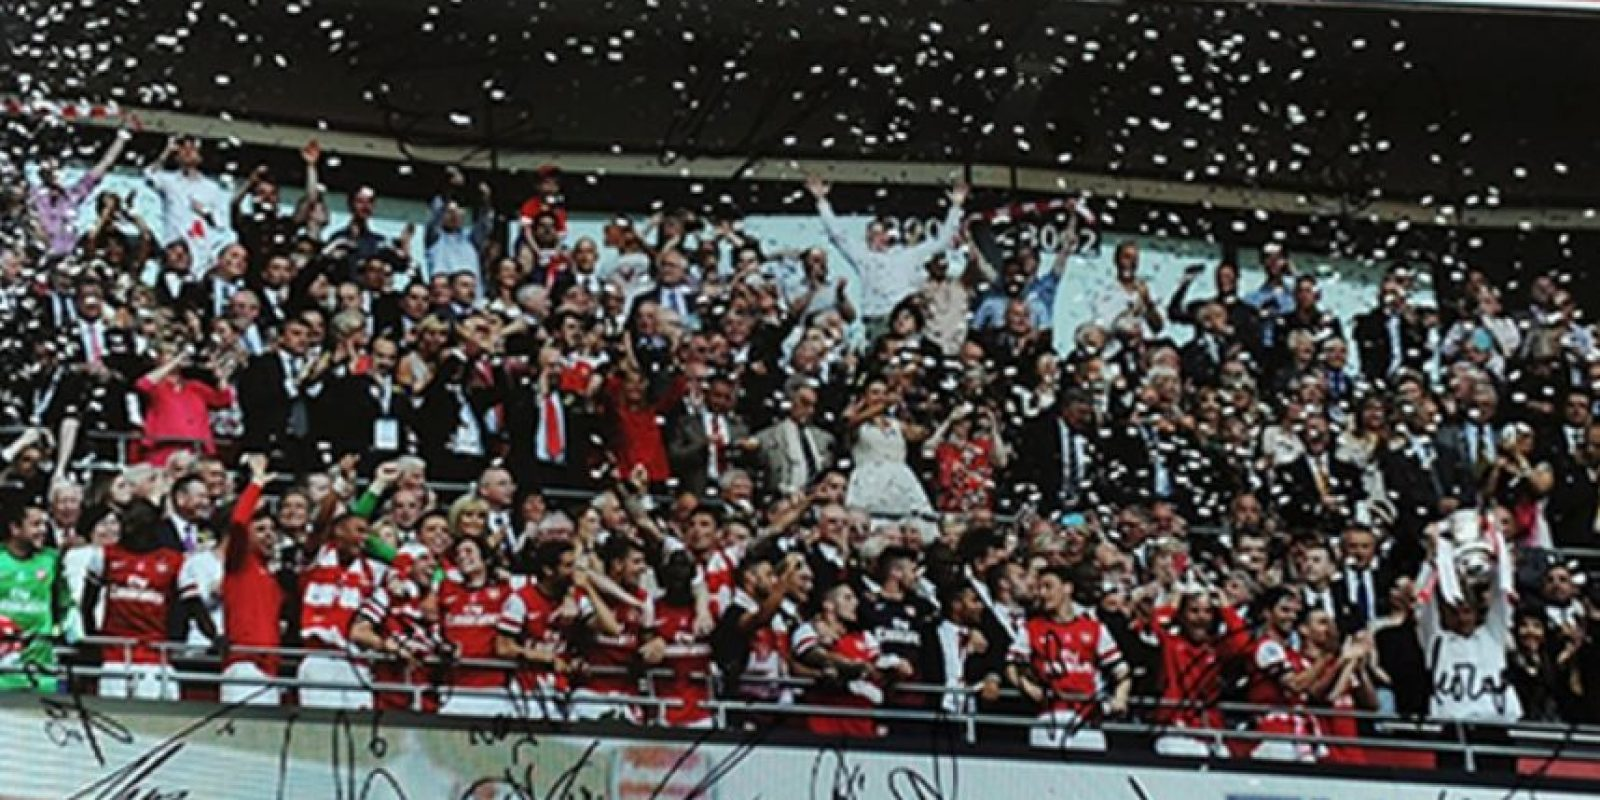 Foto del Arsenal con el trofeo de la FA Cup. Foto:unitedcharity.de